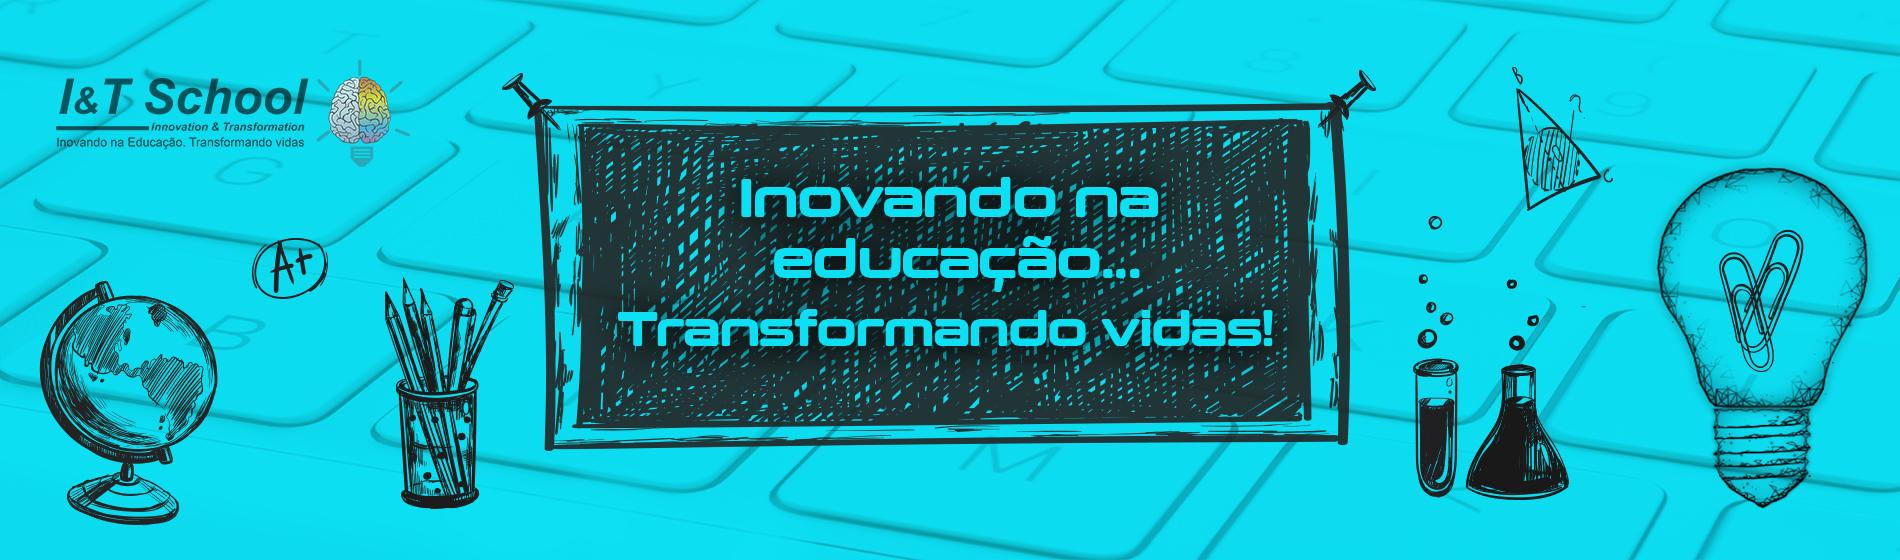 I&T School